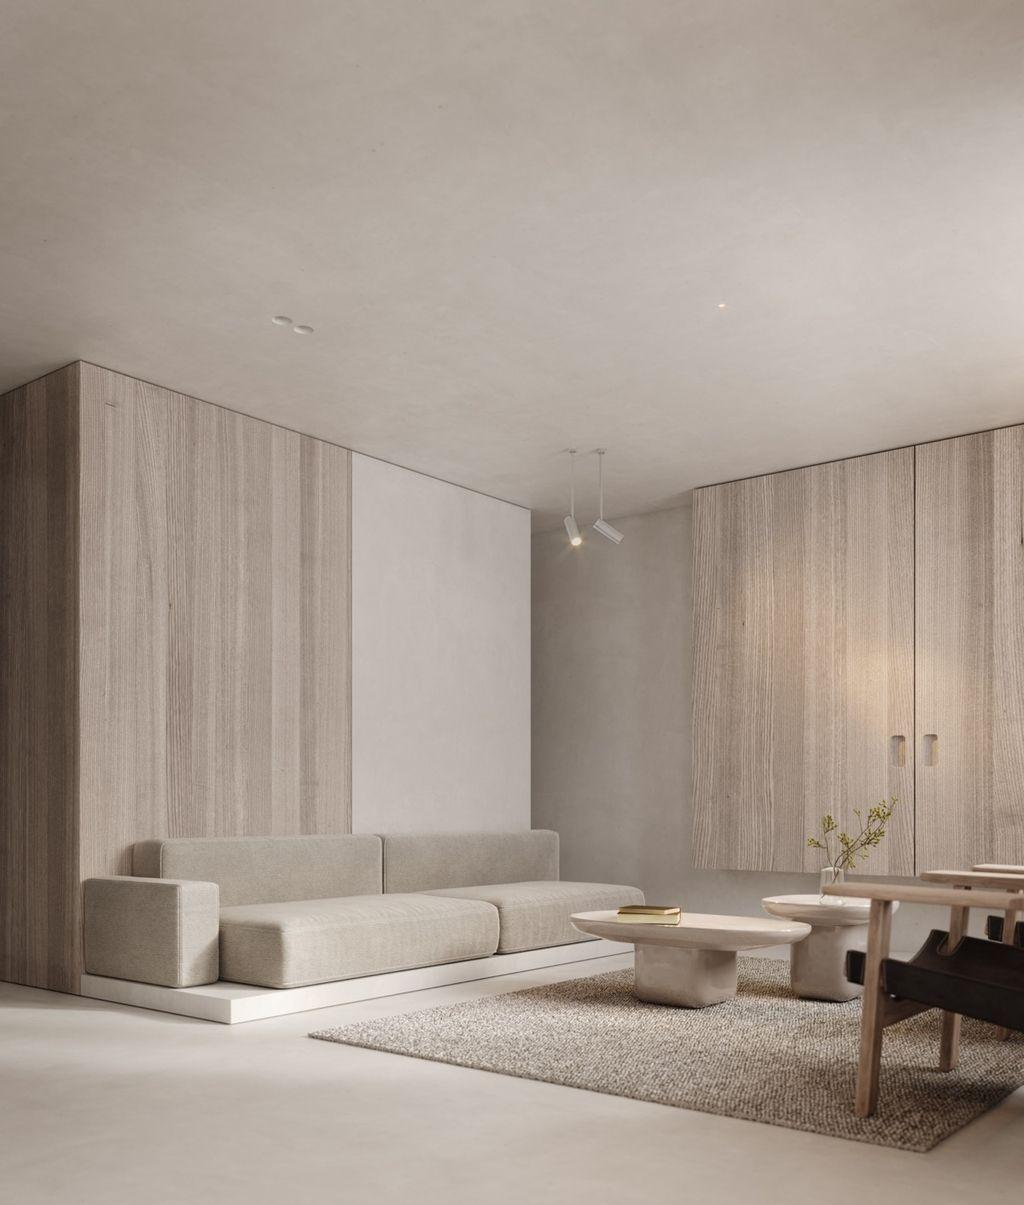 40 Awesome Minimalist Interior Design Ideas To Try Modern Minimalist Interior Modern Minimalist Interior Design Minimalist Home Interior Room interior design ideas